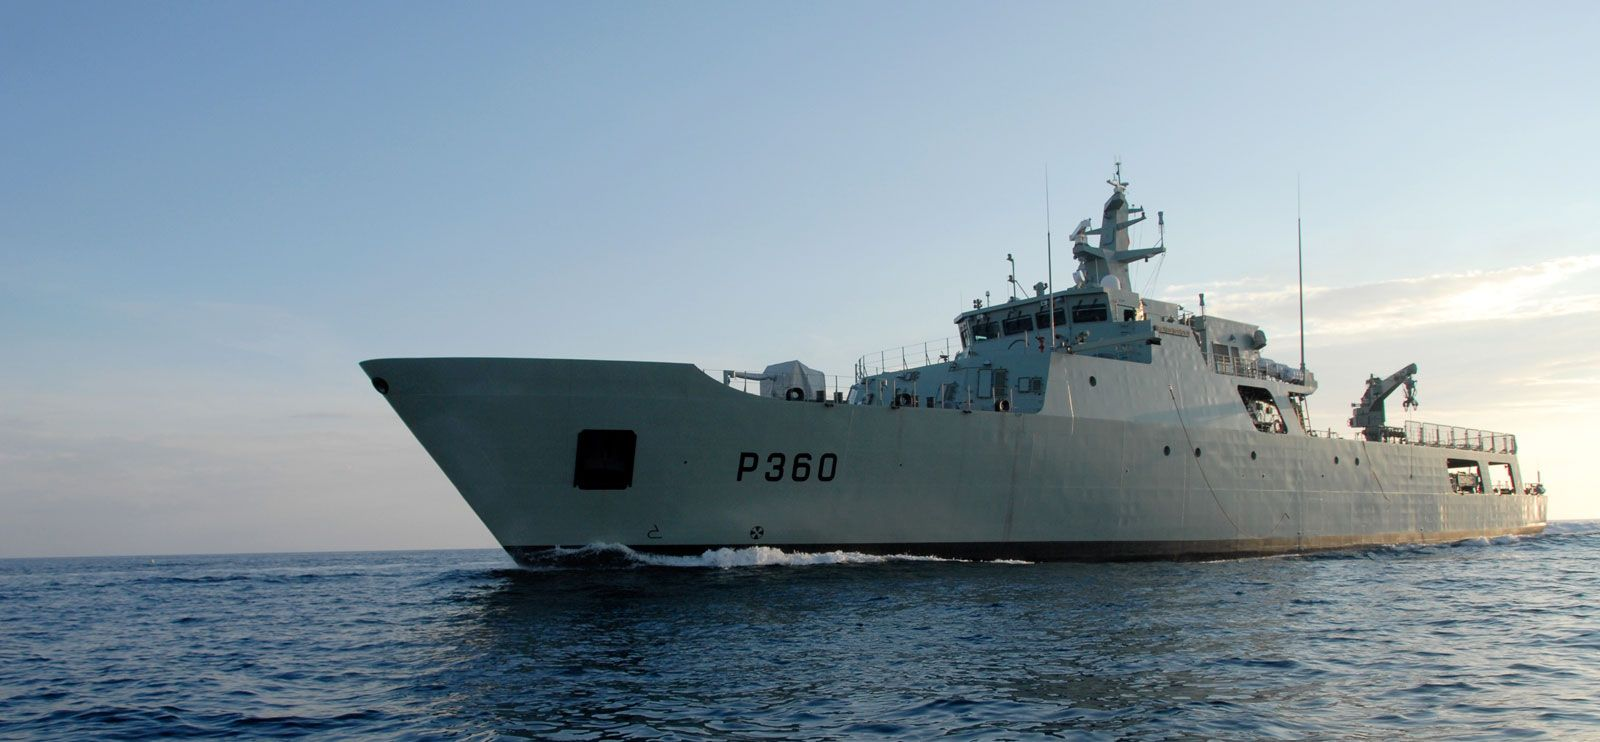 Foto/ Portal da Marinha